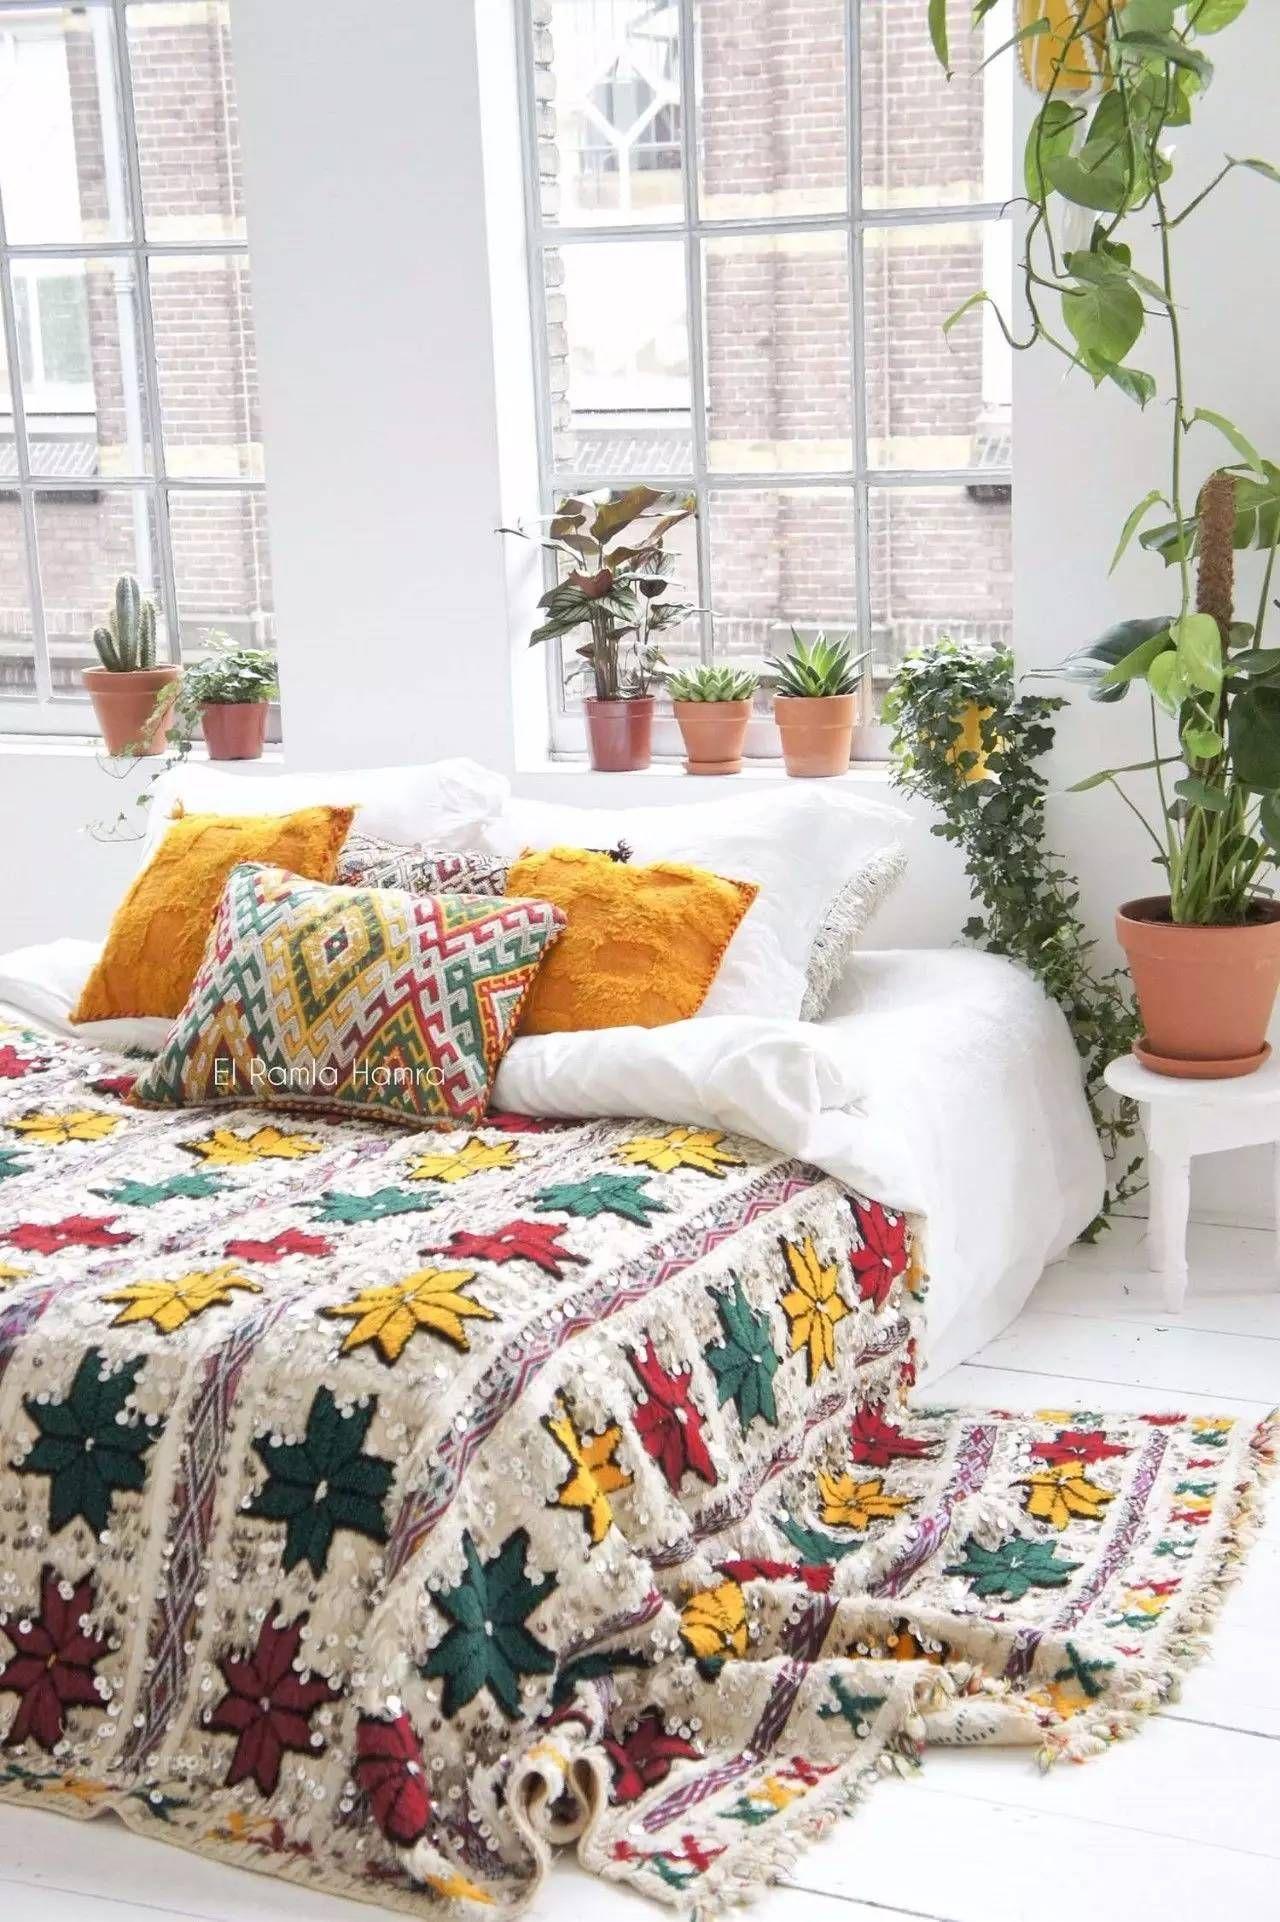 les 10 commandements d 39 une d co boho elephant in the. Black Bedroom Furniture Sets. Home Design Ideas